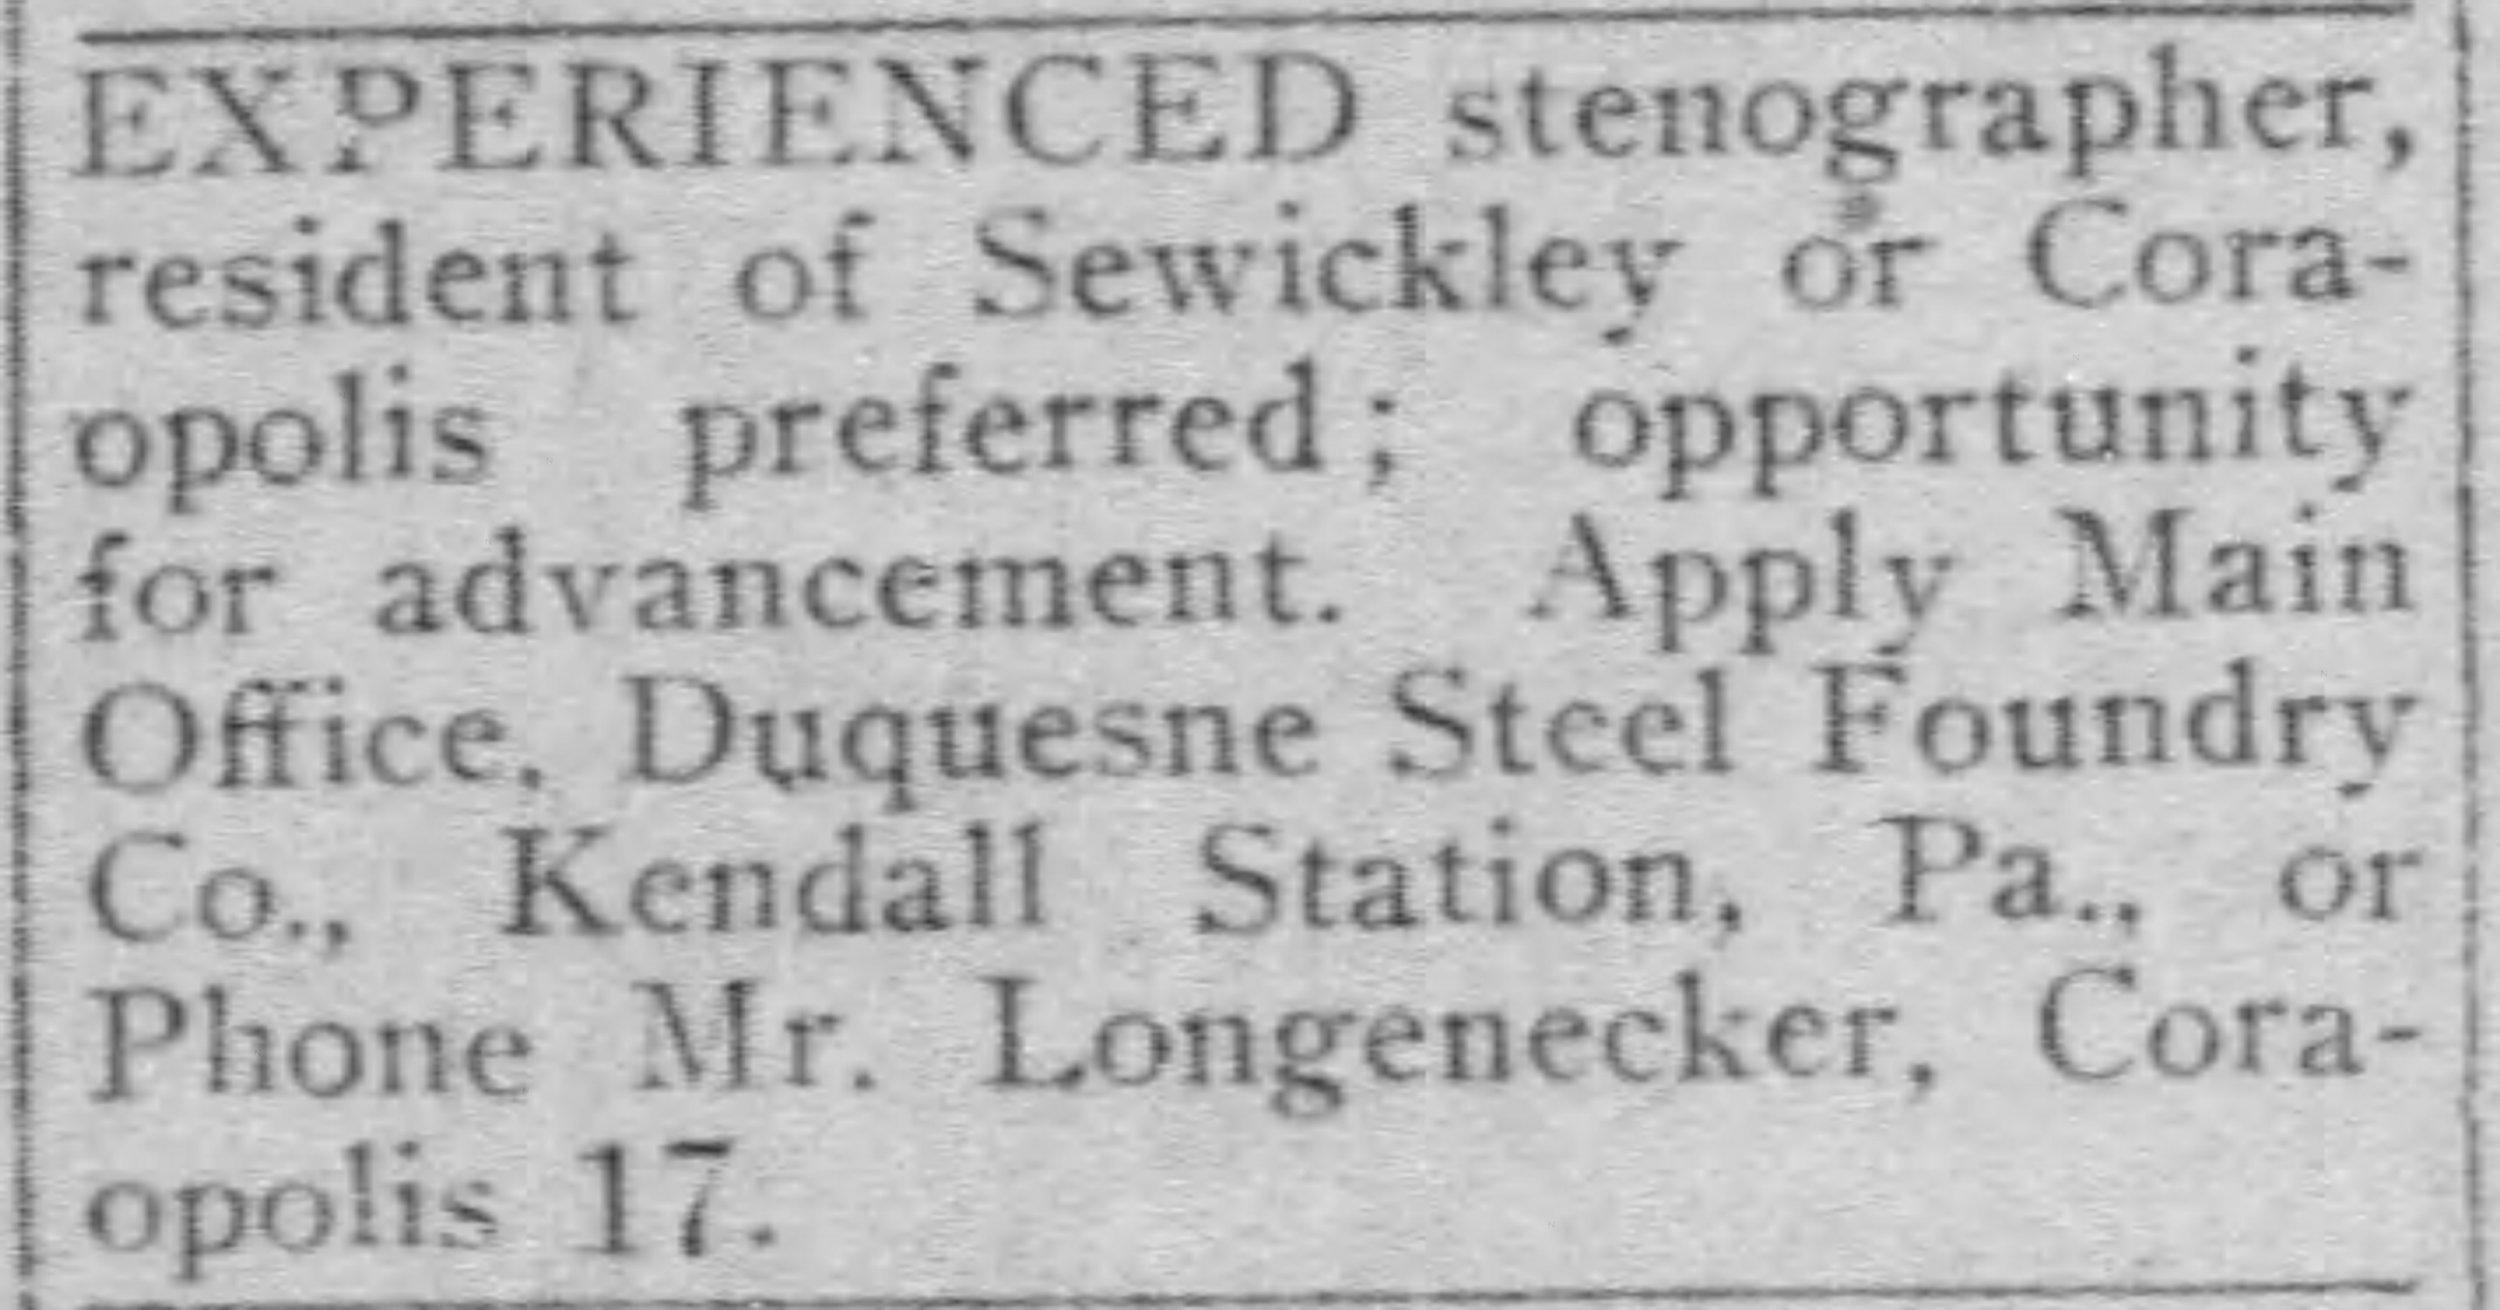 Pittsburgh Post Gazette, March 22, 1919